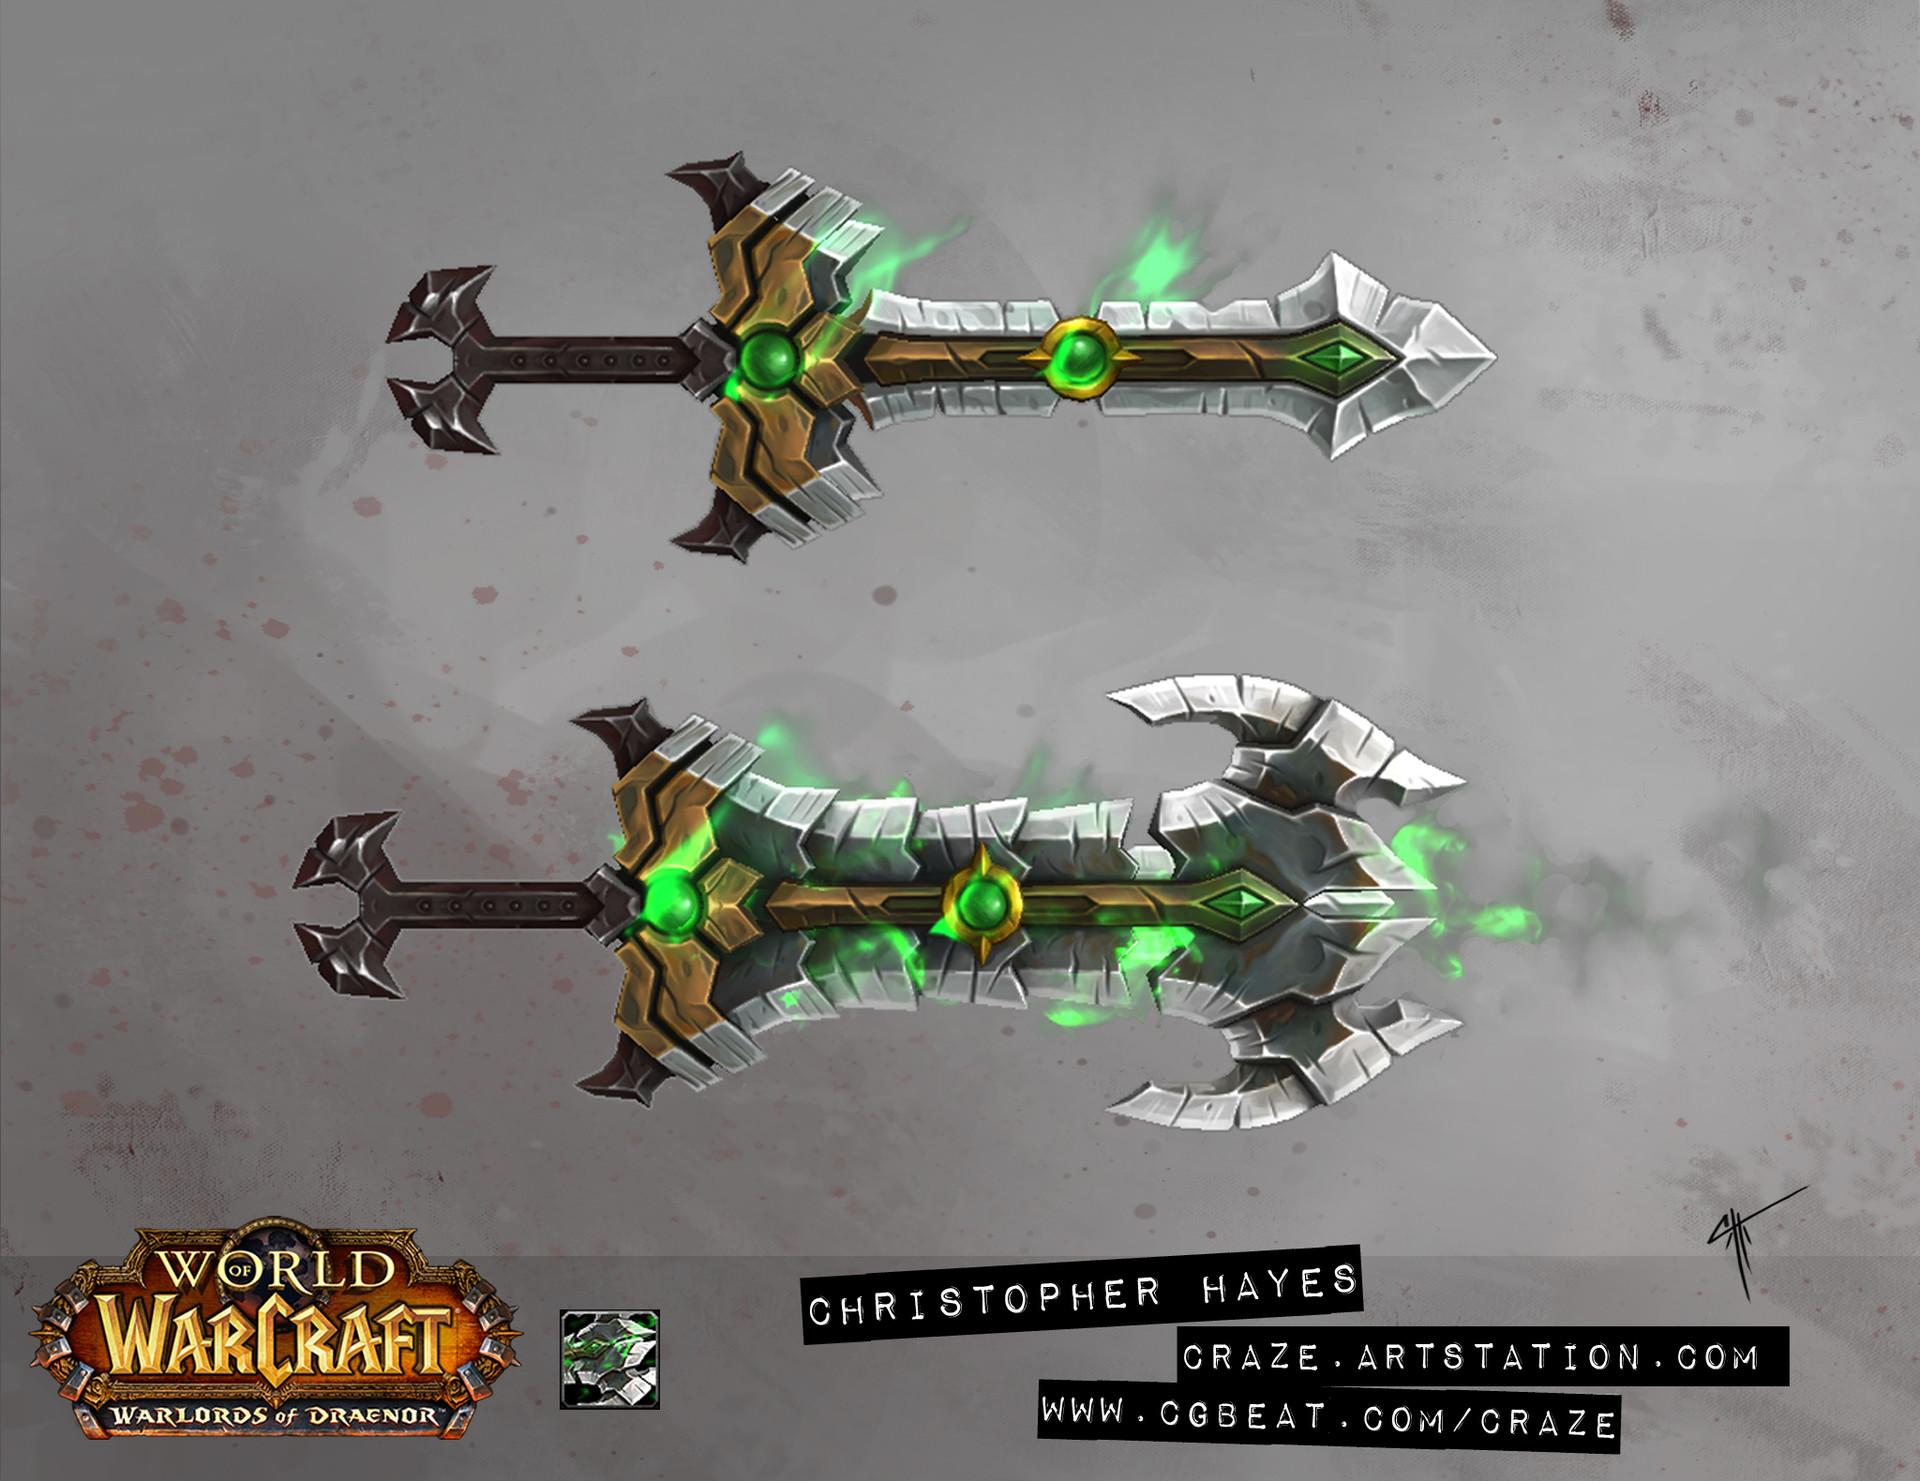 Christopher hayes challenge sword